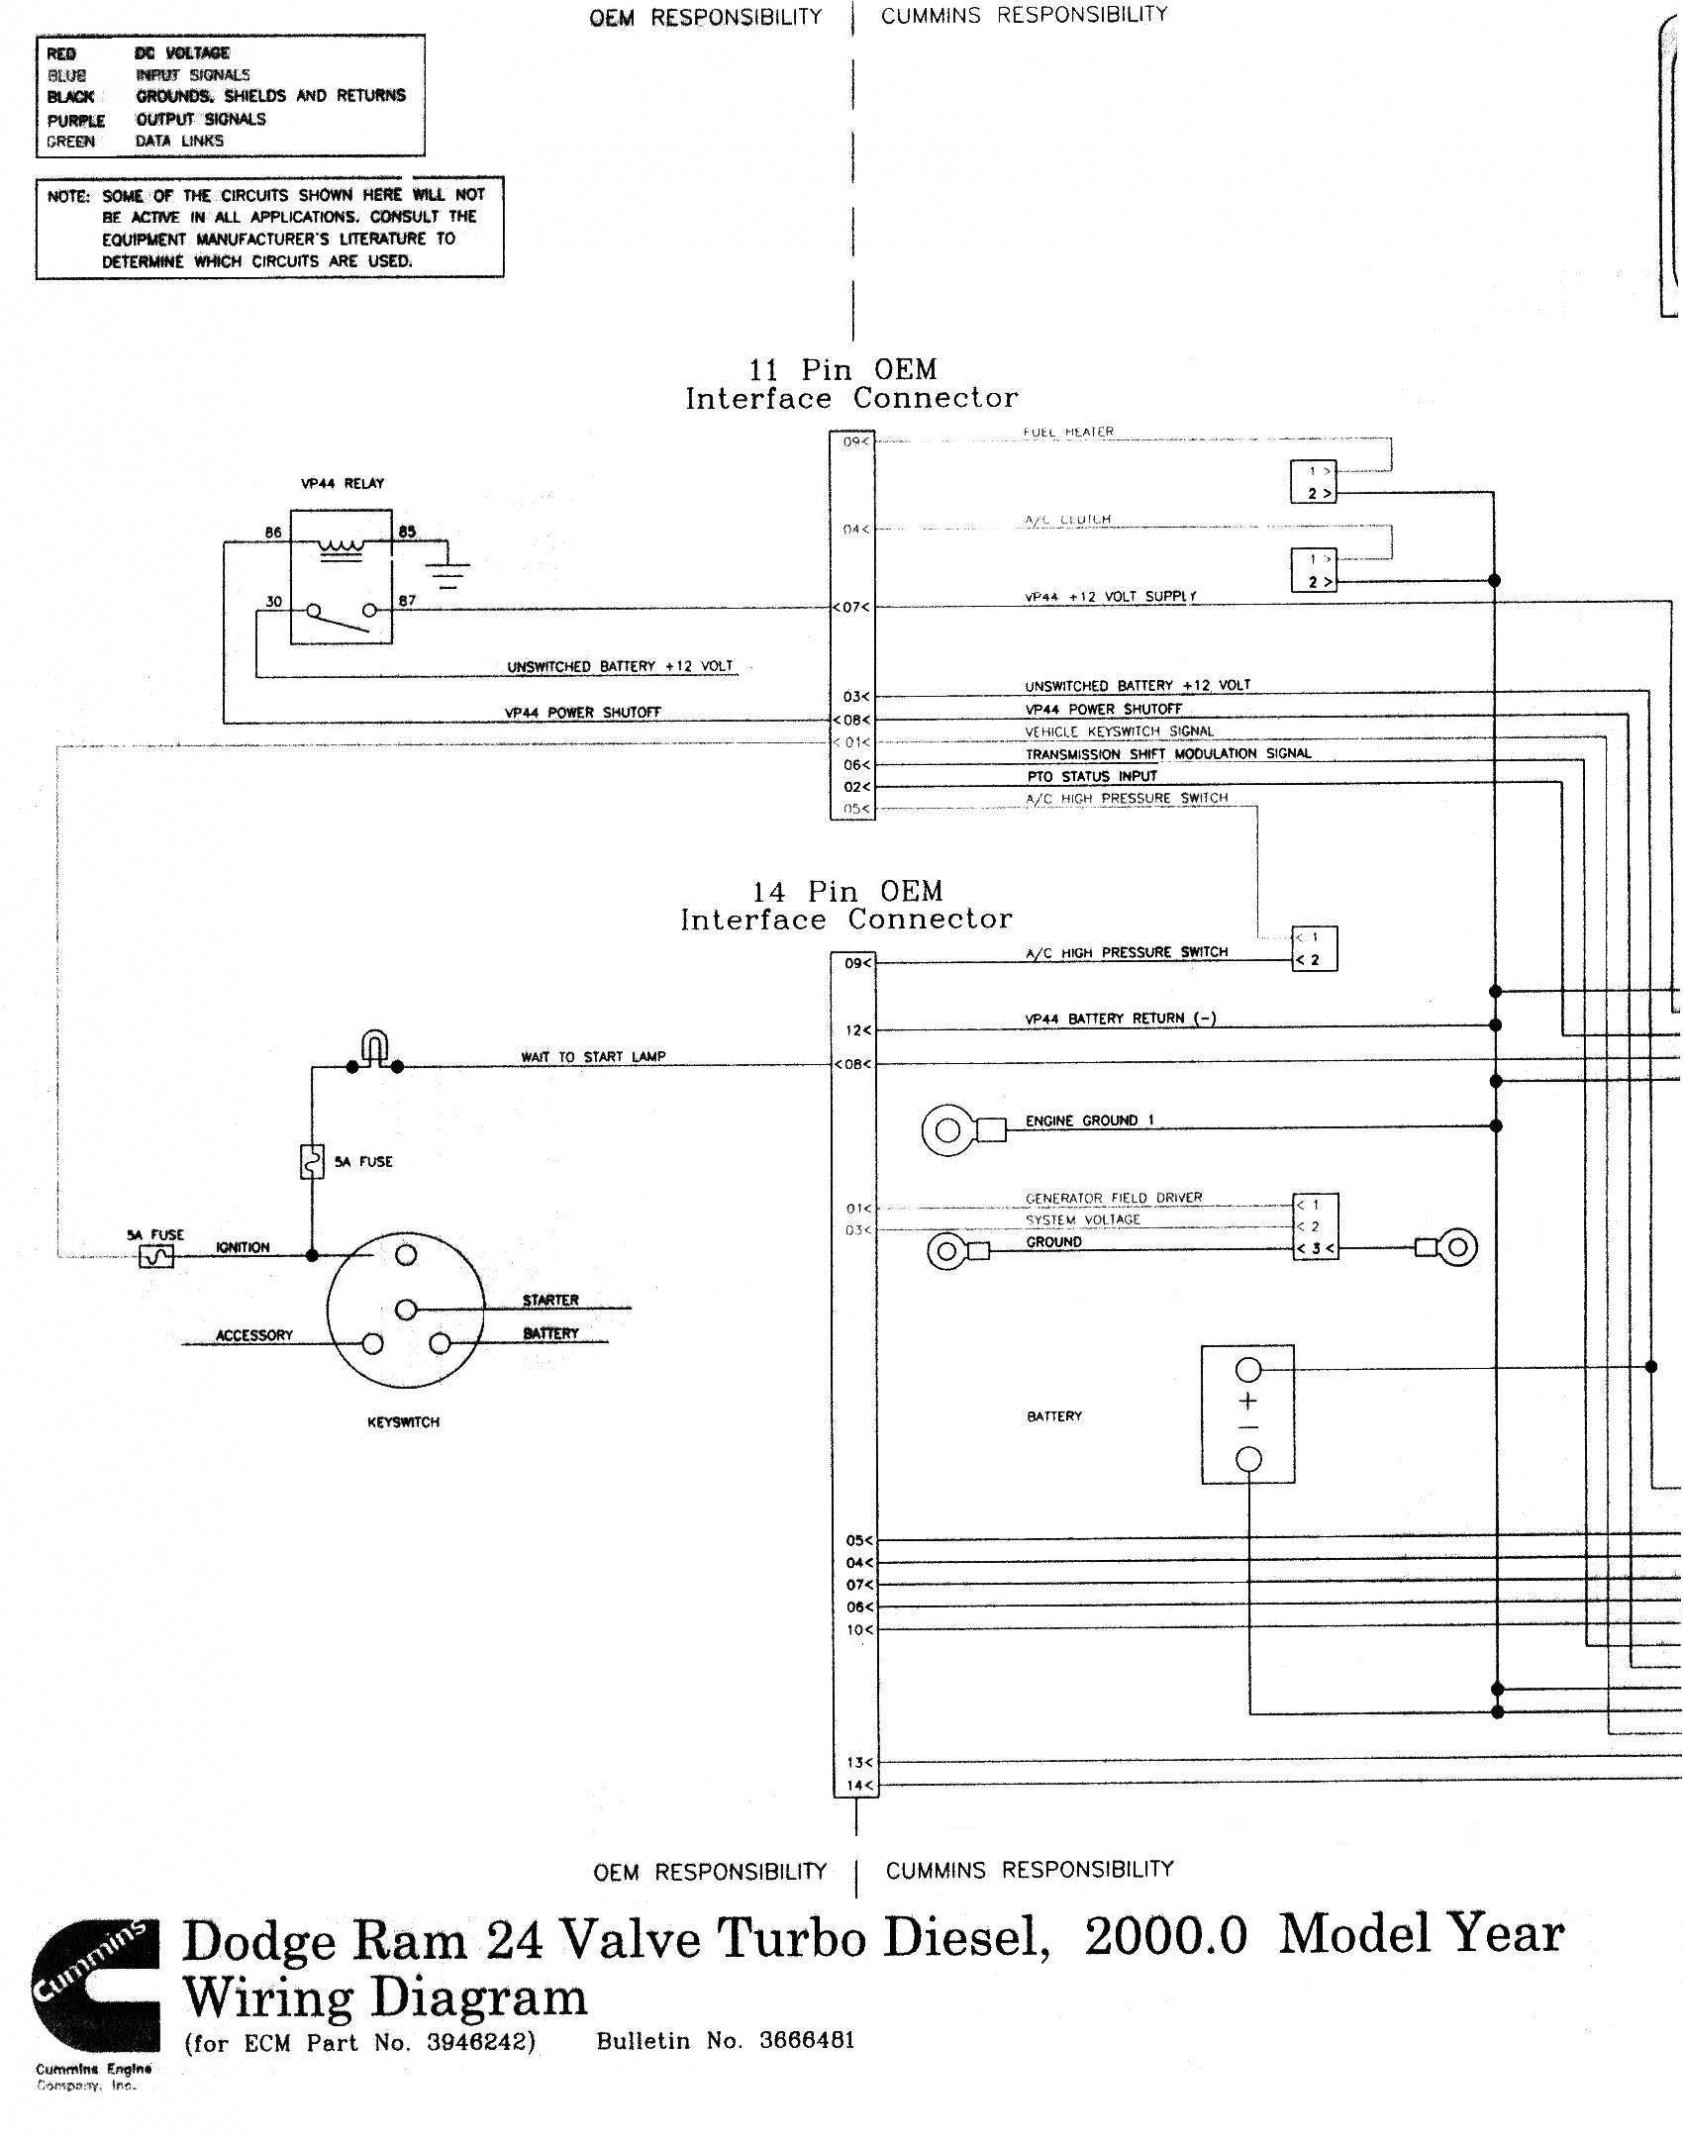 2002 Dodge Ram 1500 Wiring Diagram 2002 Dodge Ram 1500 Abs Wiring Diagram Valid 2004 Dodge Ram 1500 Of 2002 Dodge Ram 1500 Wiring Diagram